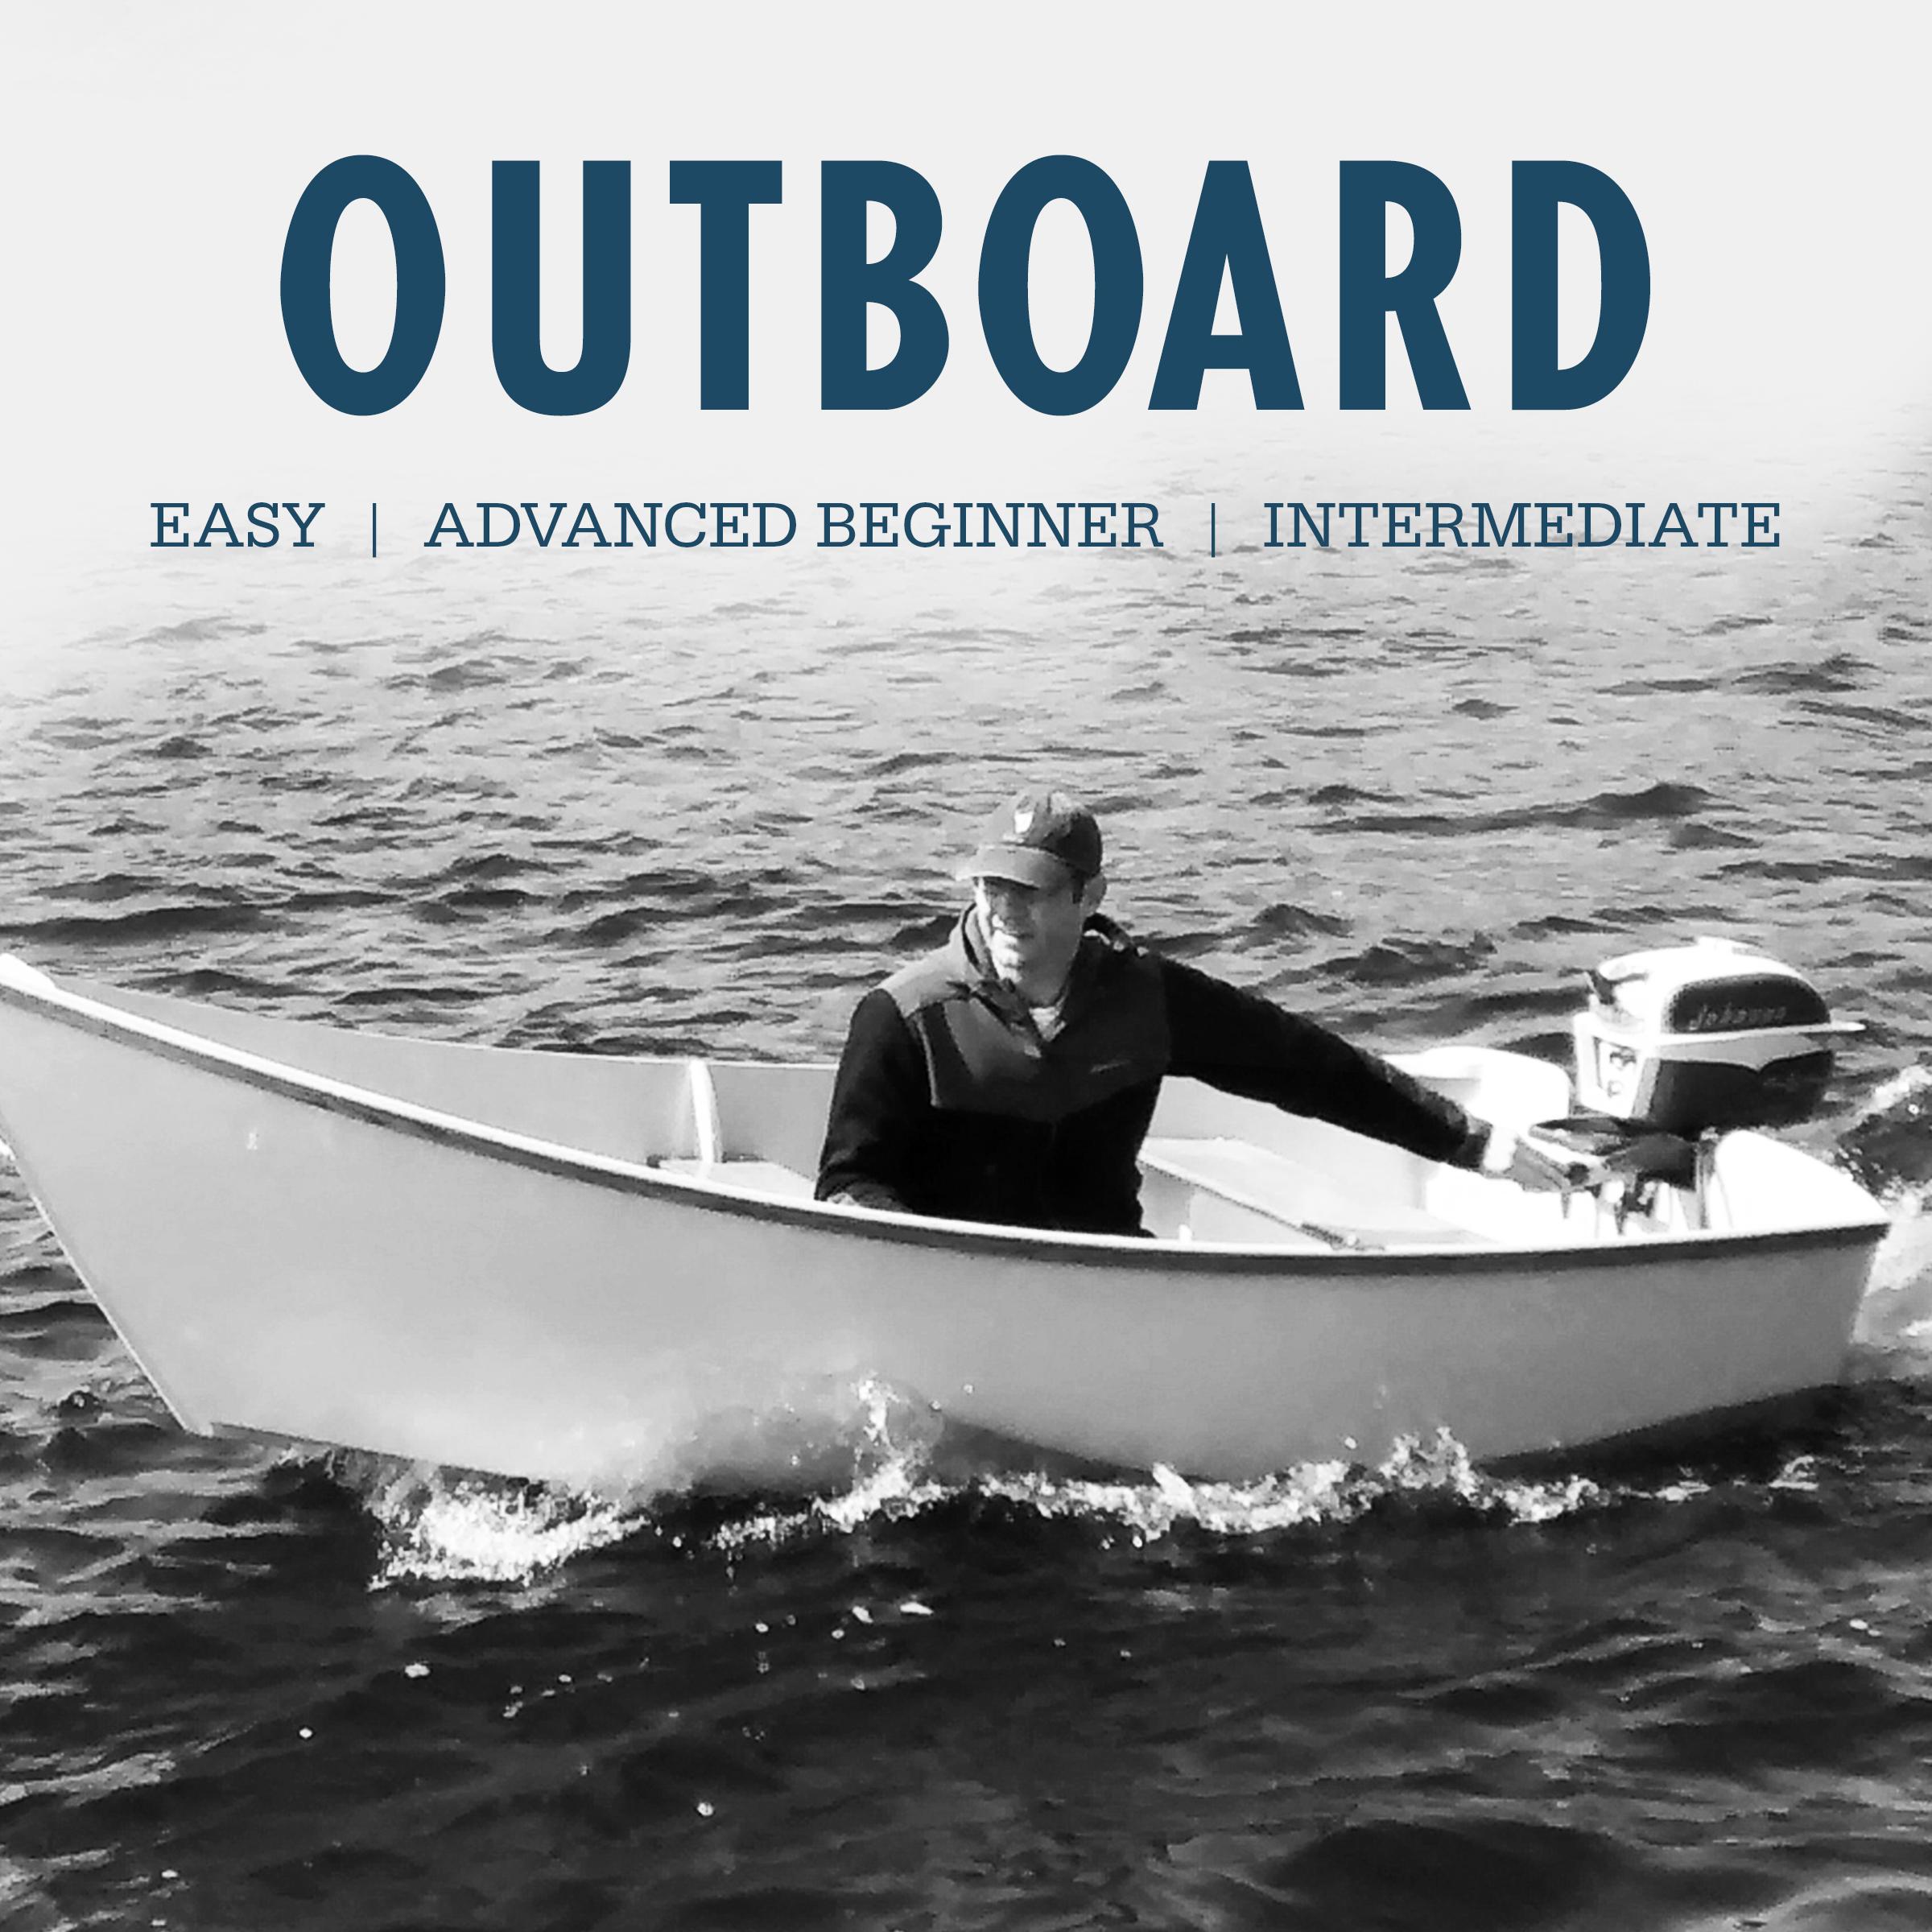 outboard.jpg